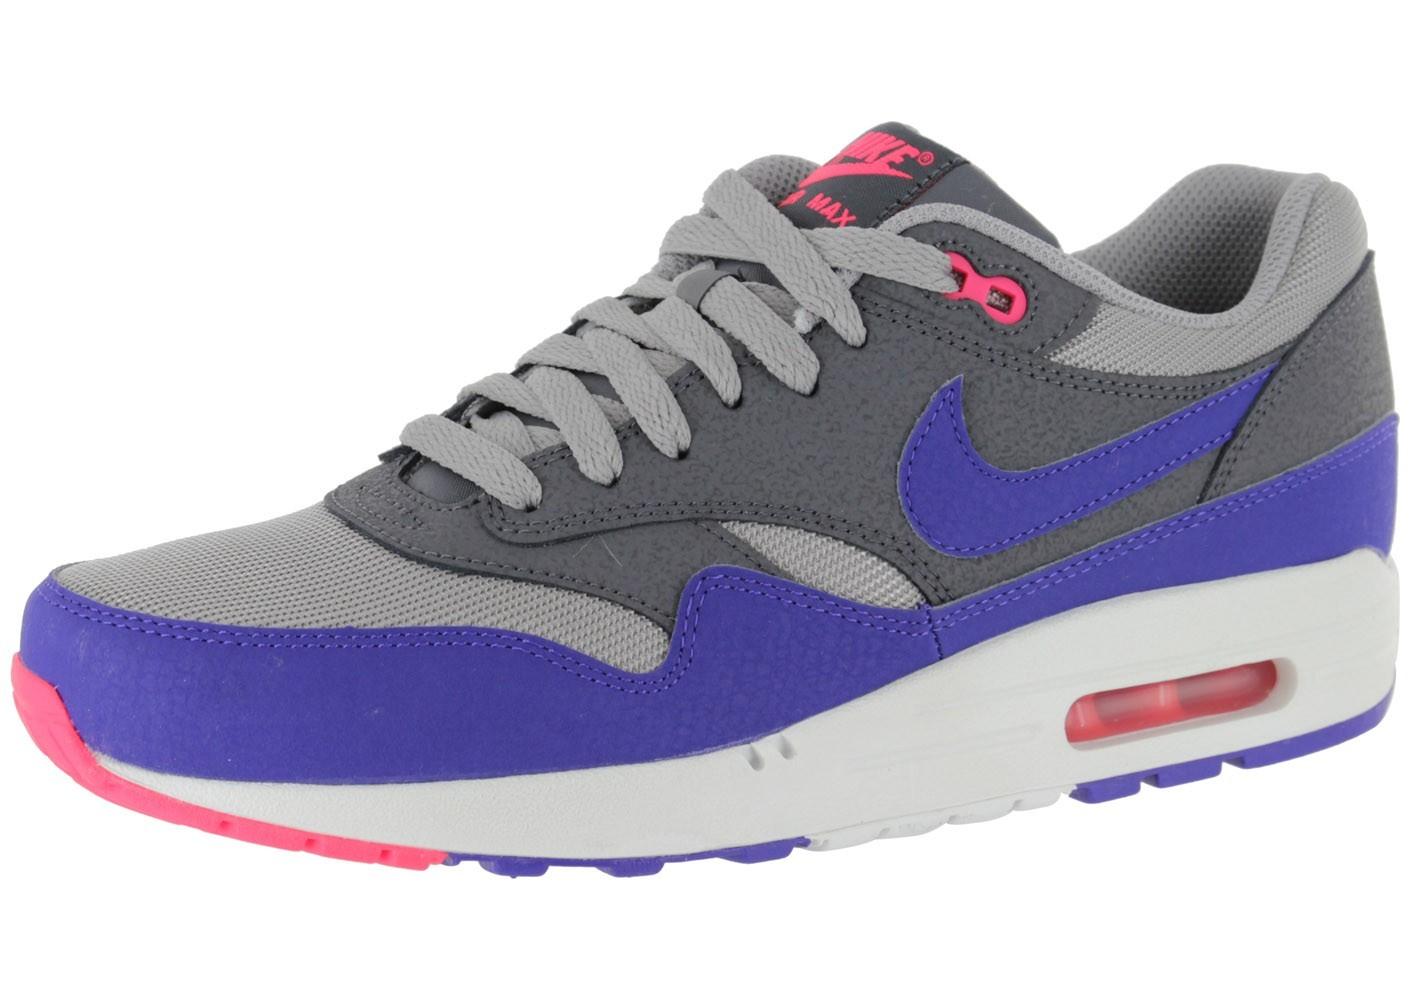 Chaussures En Remise 50% Nike Air Max 1 Pas Cher